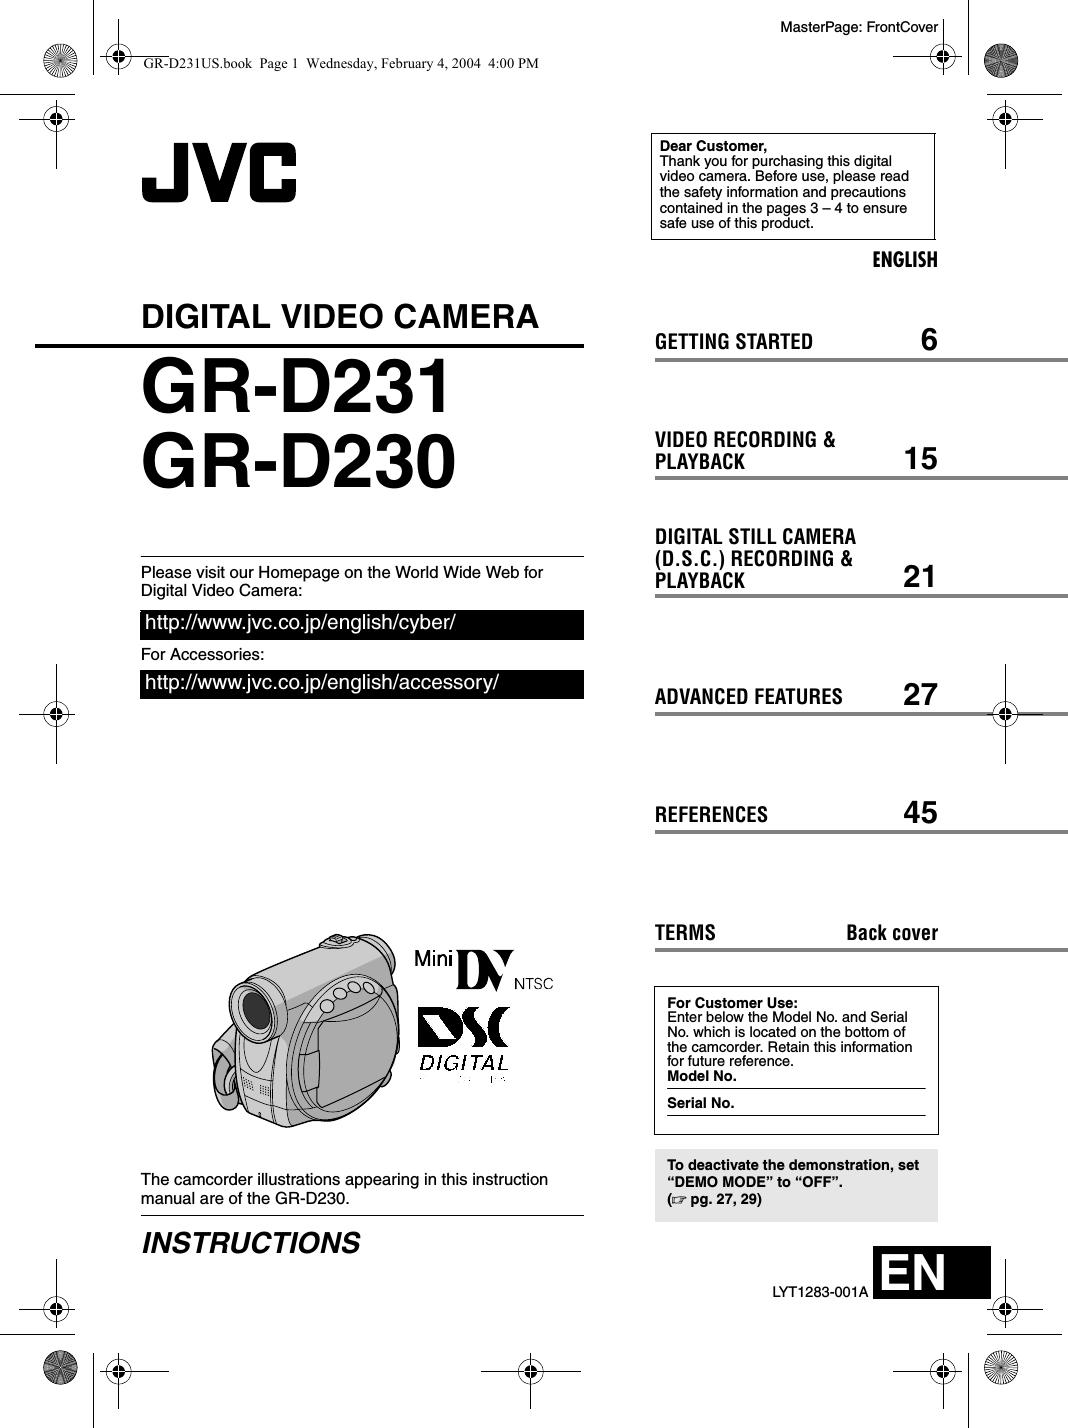 jvc gr d230us d231 230us user manual instructions lyt1283 001a rh usermanual wiki